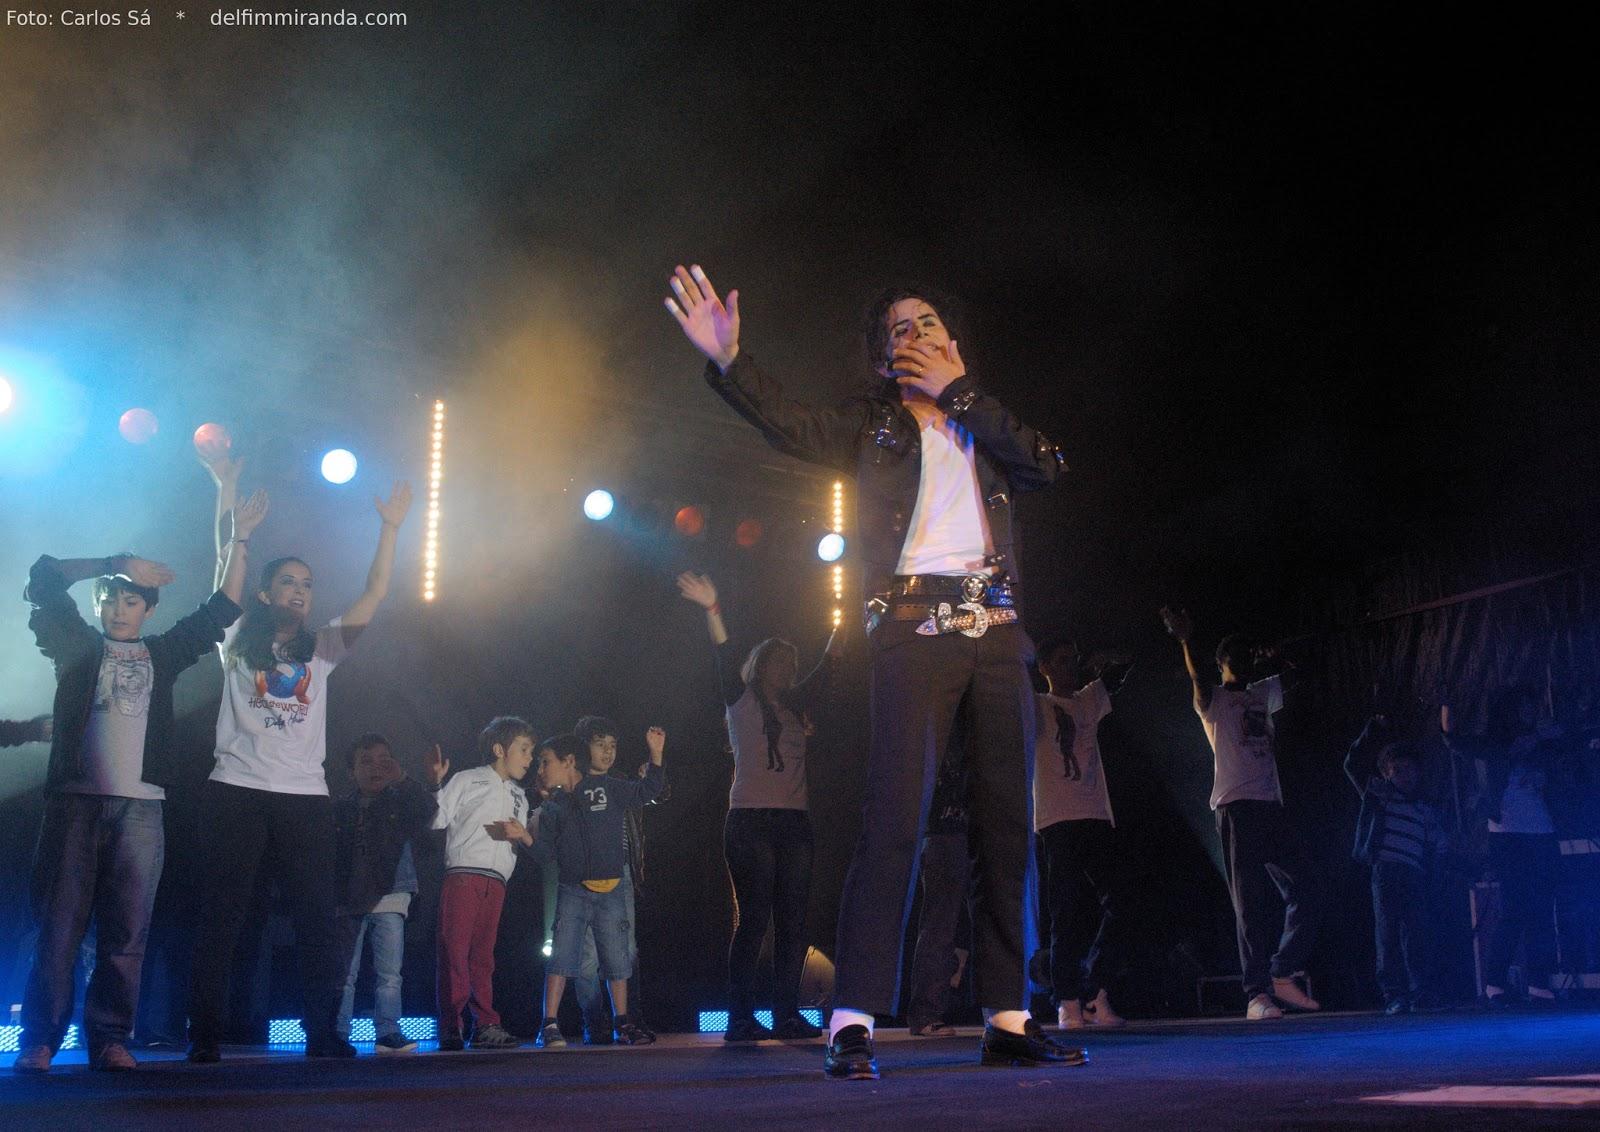 Delfim Miranda - Michael Jackson Tribute - Heal the World - Live Show